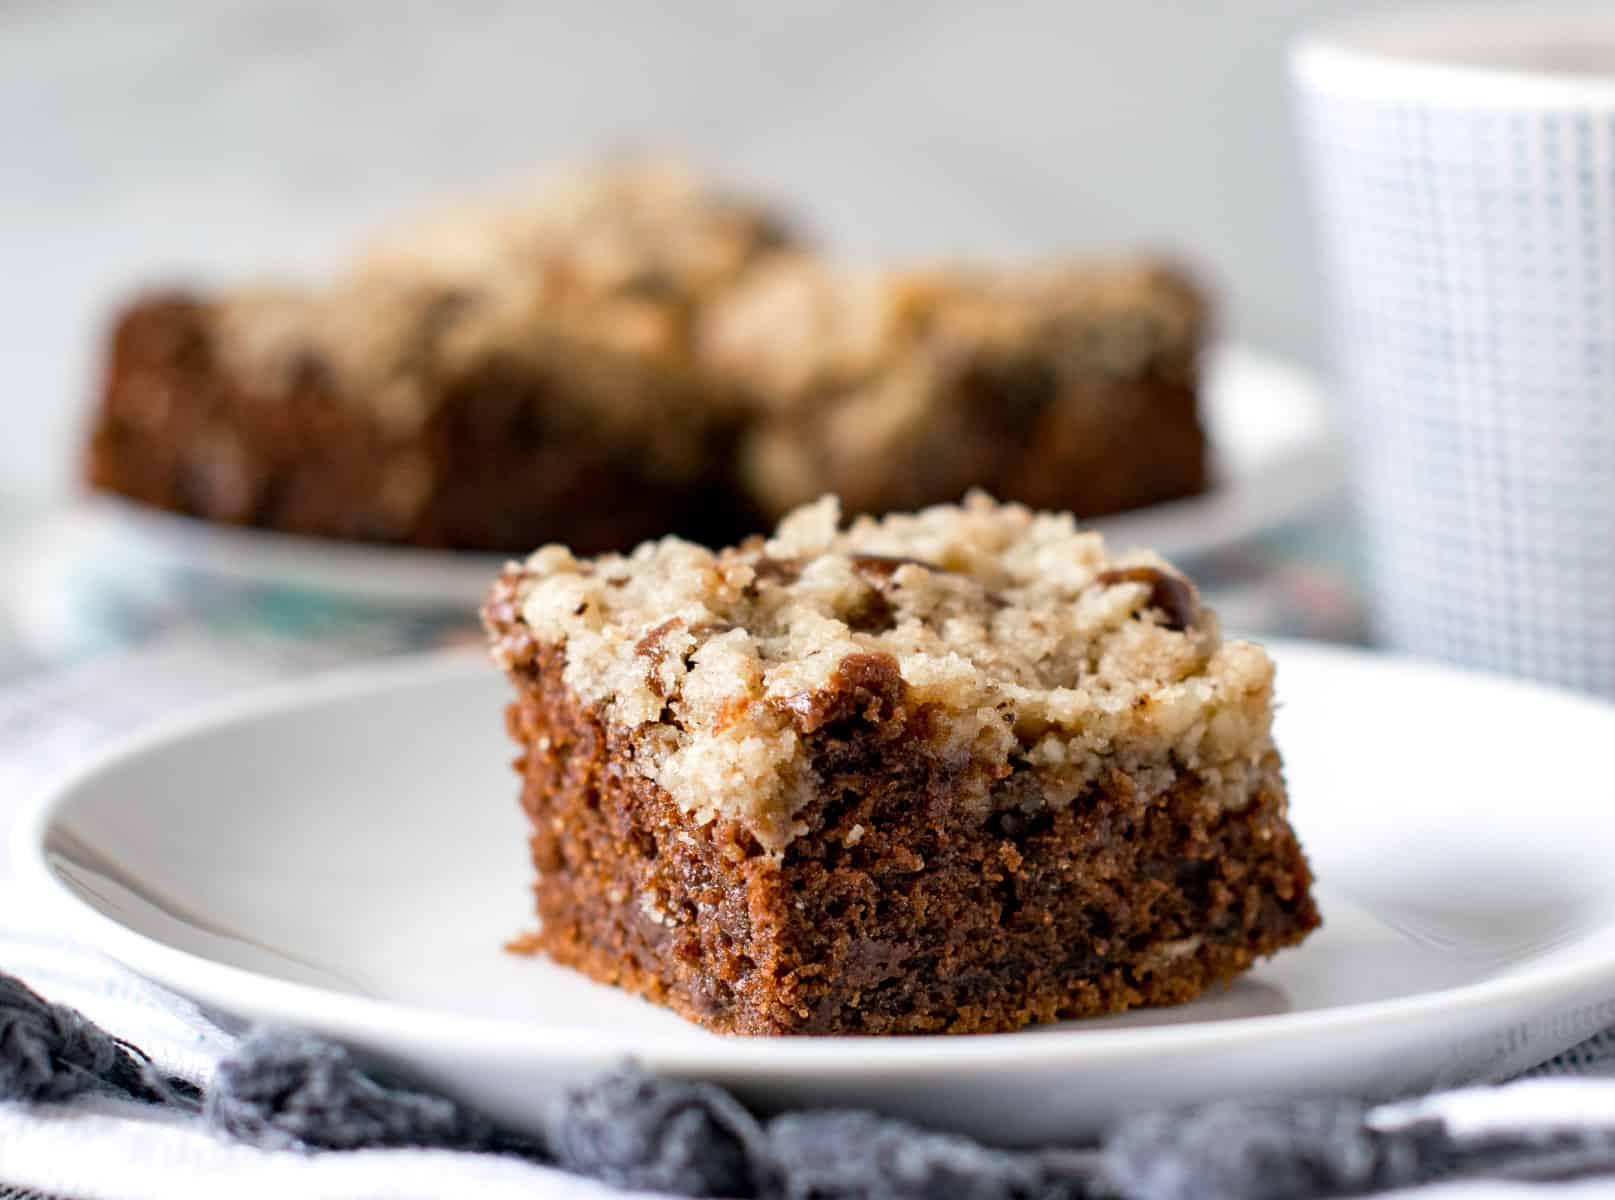 Eggless chocolate coffee crumb cake served with tea